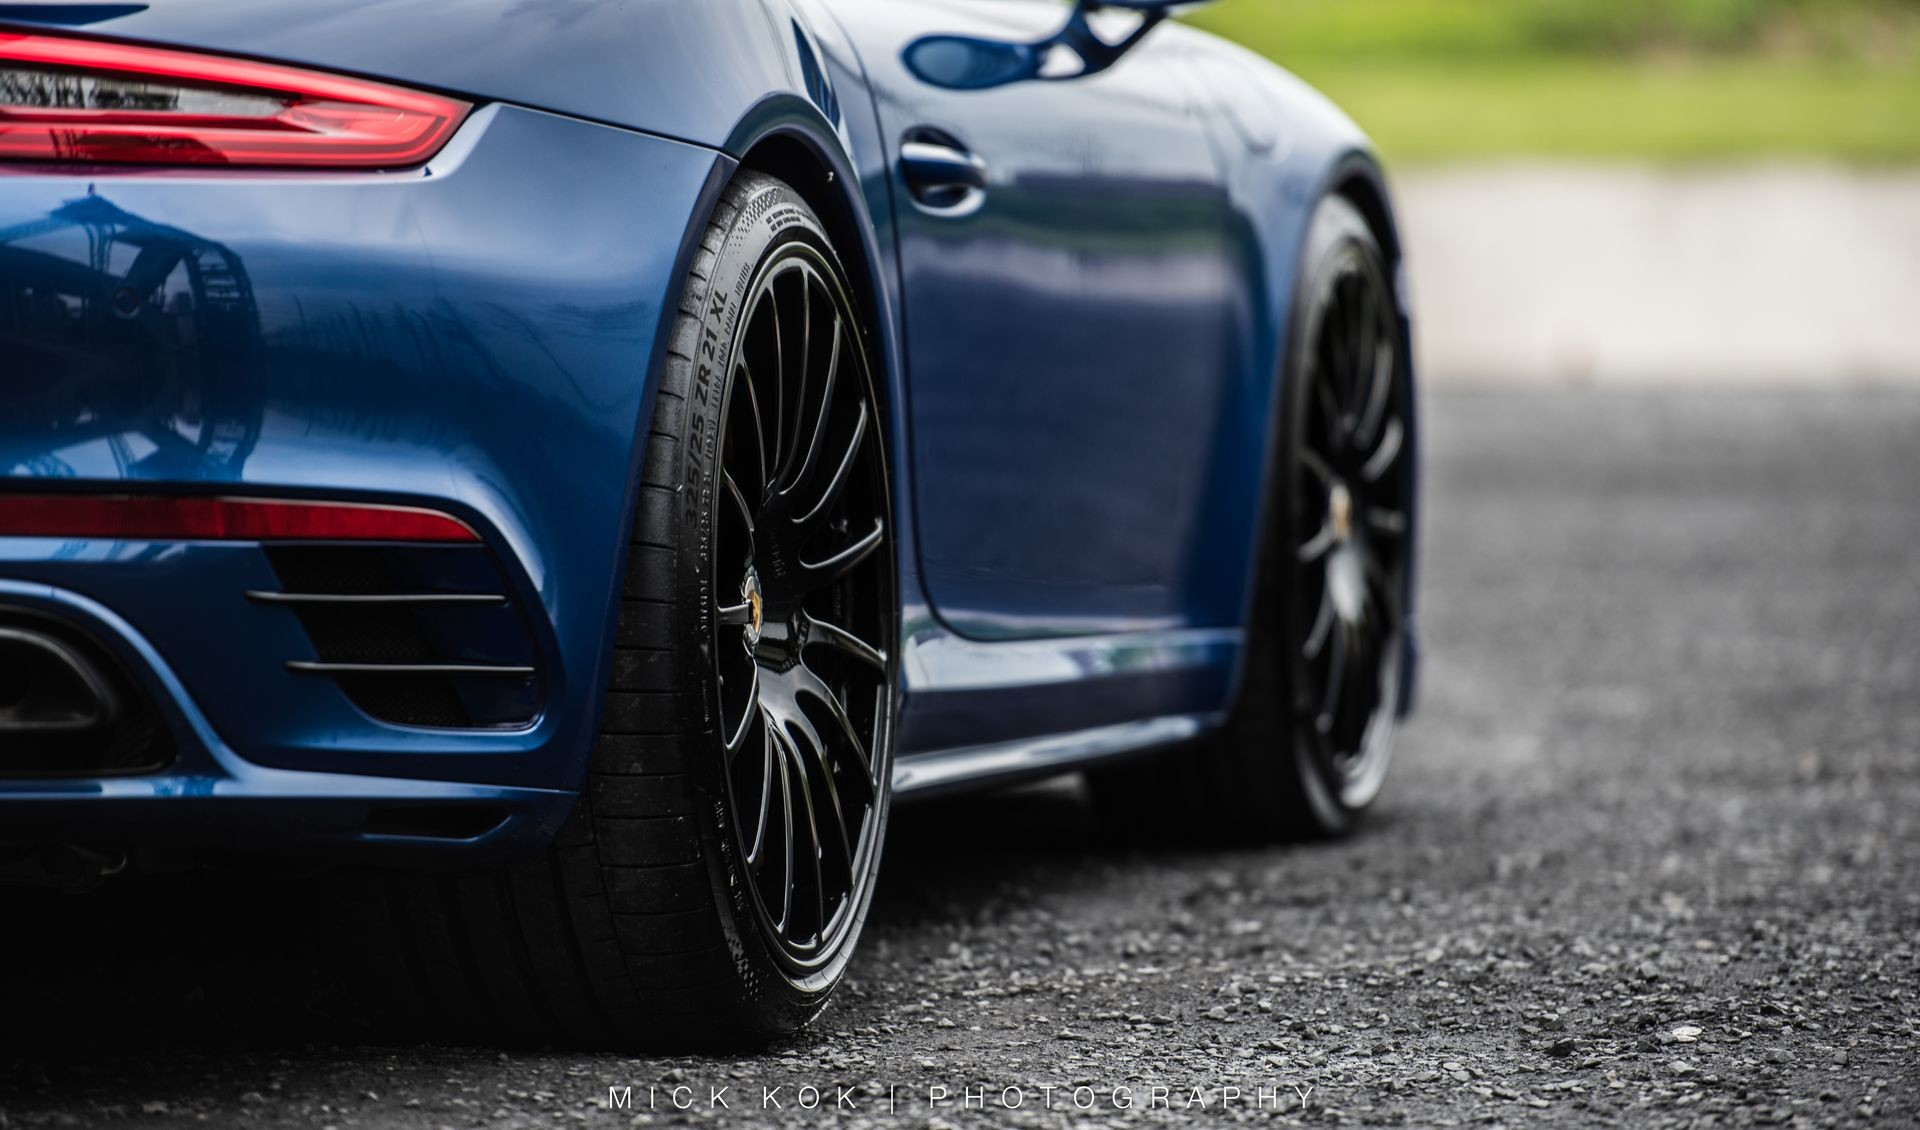 Porsche 911 Turbo S Blue Arrow